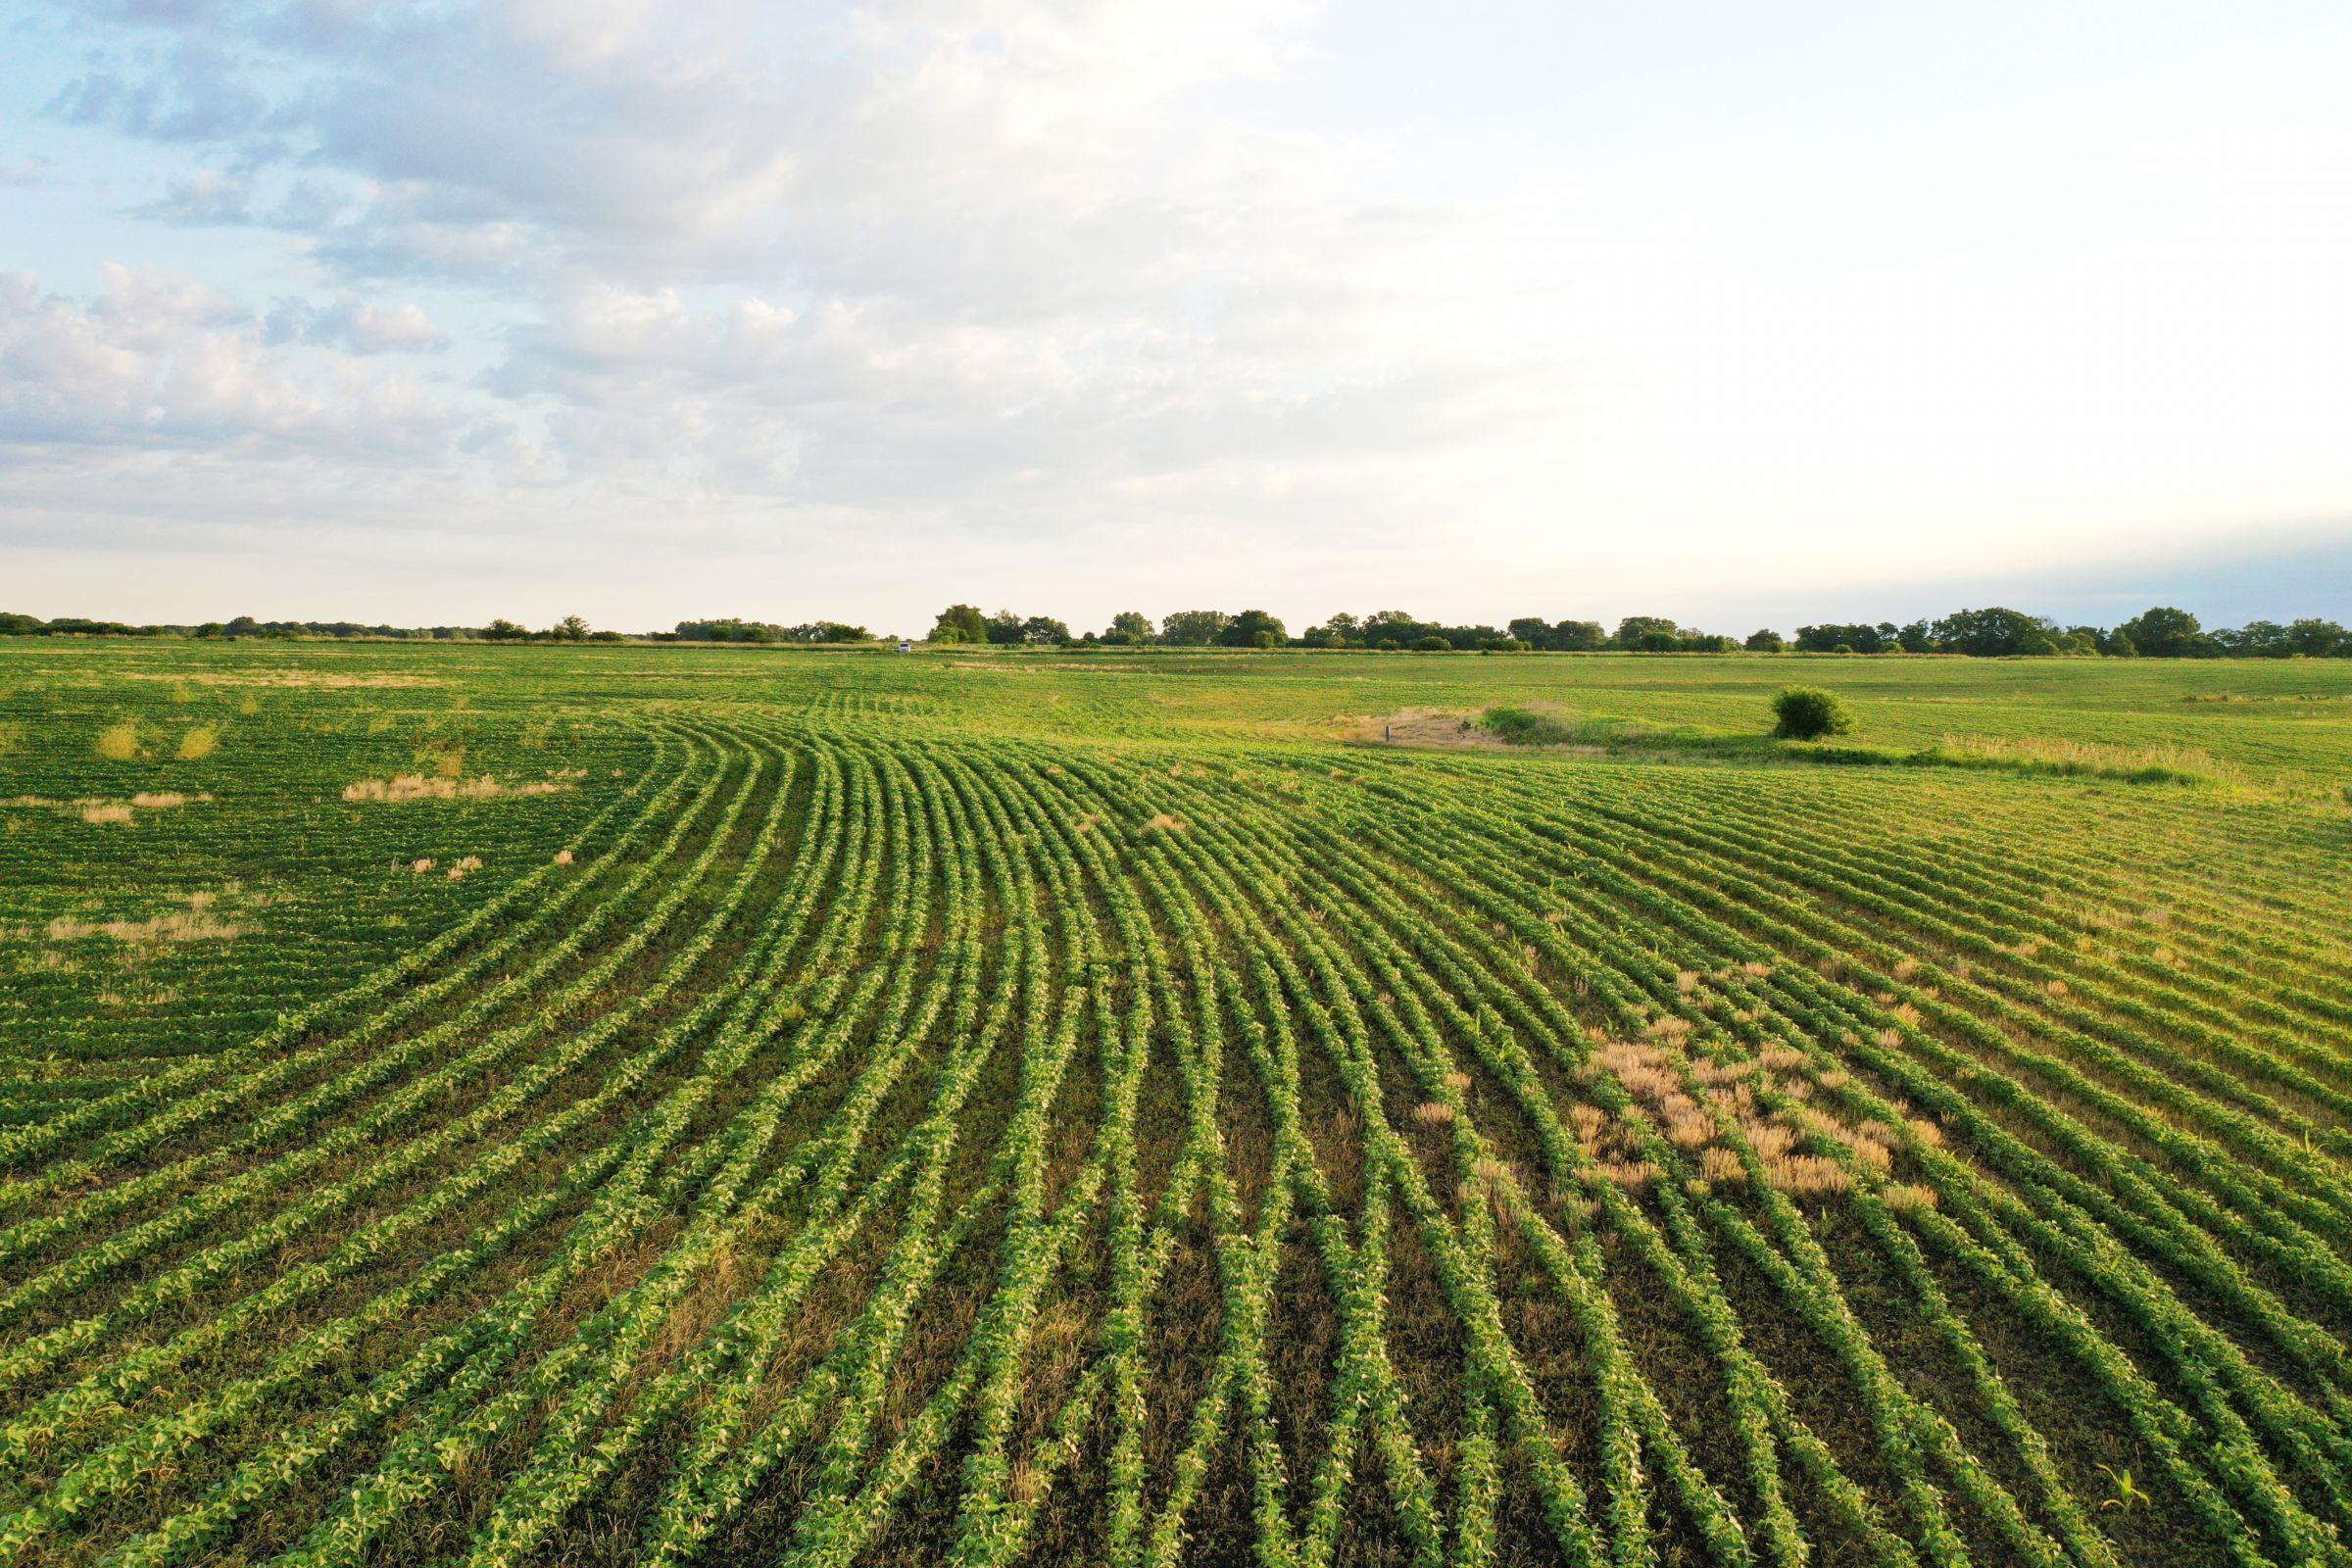 land-clarke-county-iowa-883-acres-listing-number-15596-11-2021-06-23-163326.jpg